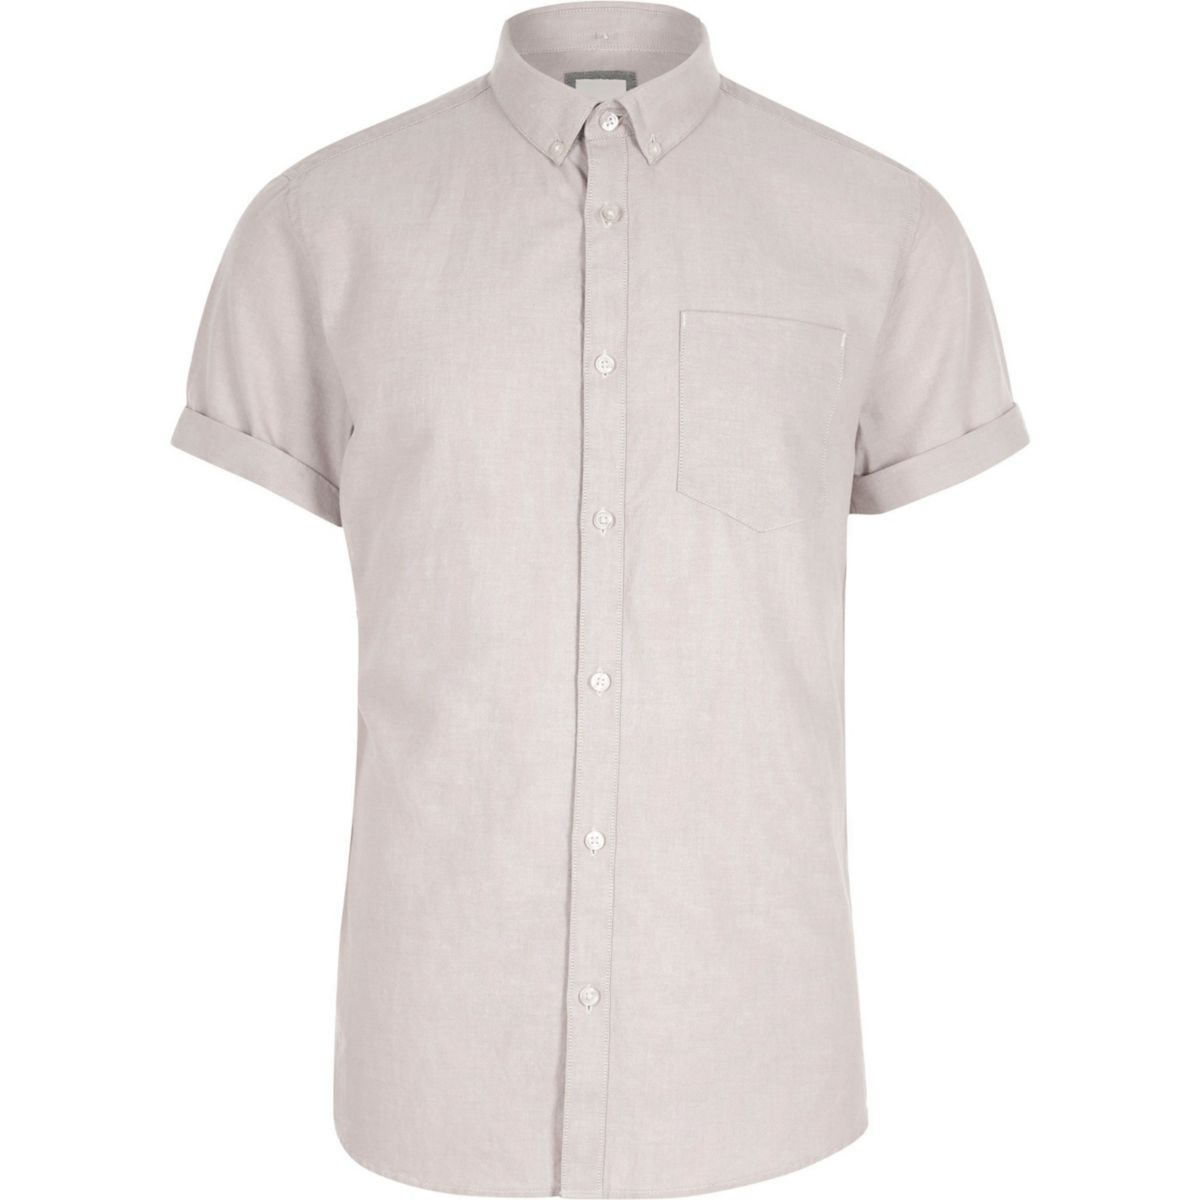 Cream short sleeve button-down casual shirt